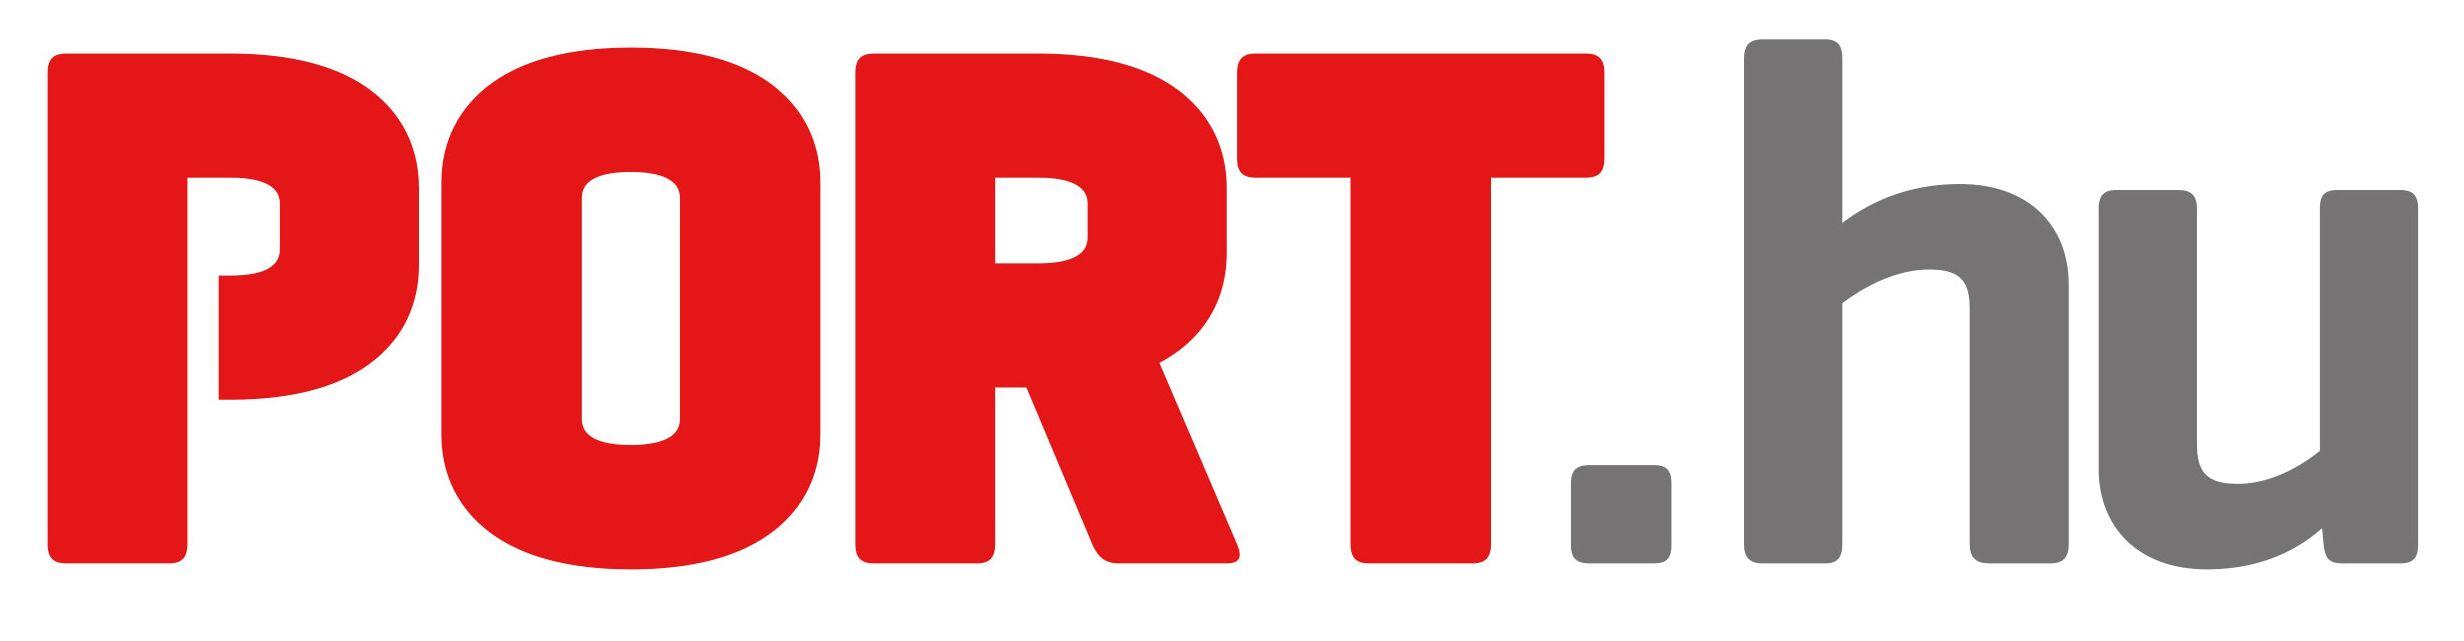 Fileport Hu Logo Png